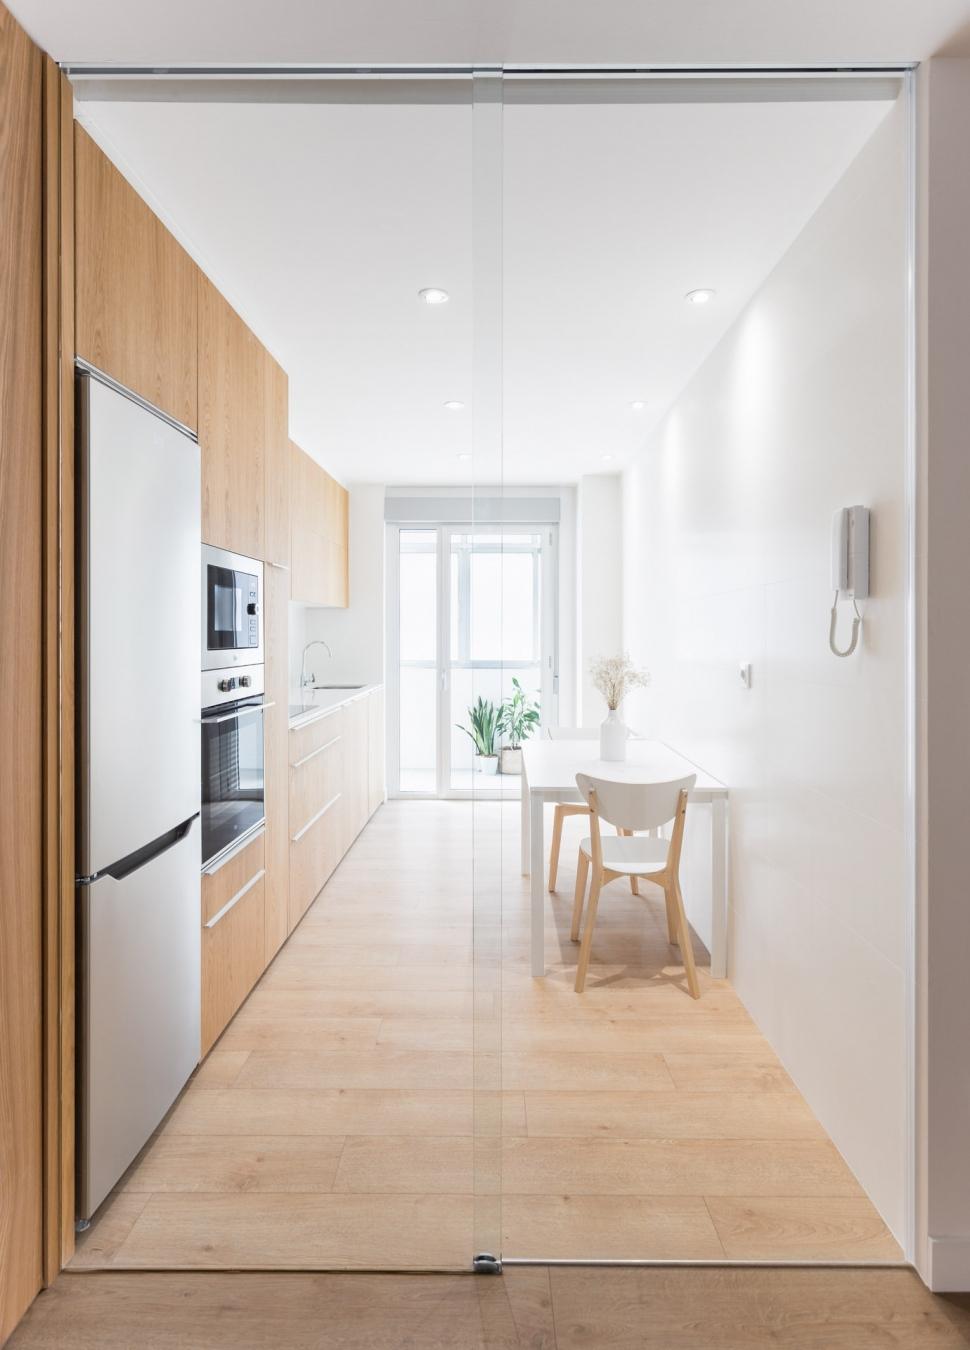 Reforma integral de vivienda | Encaixe ArquitecturaReforma integral de vivienda | Encaixe Arquitecturaº - Reforma integral de vivienda | Encaixe Arquitectura - Reforma integral de vivienda | Encaixe Arquitectura | Jose Chas